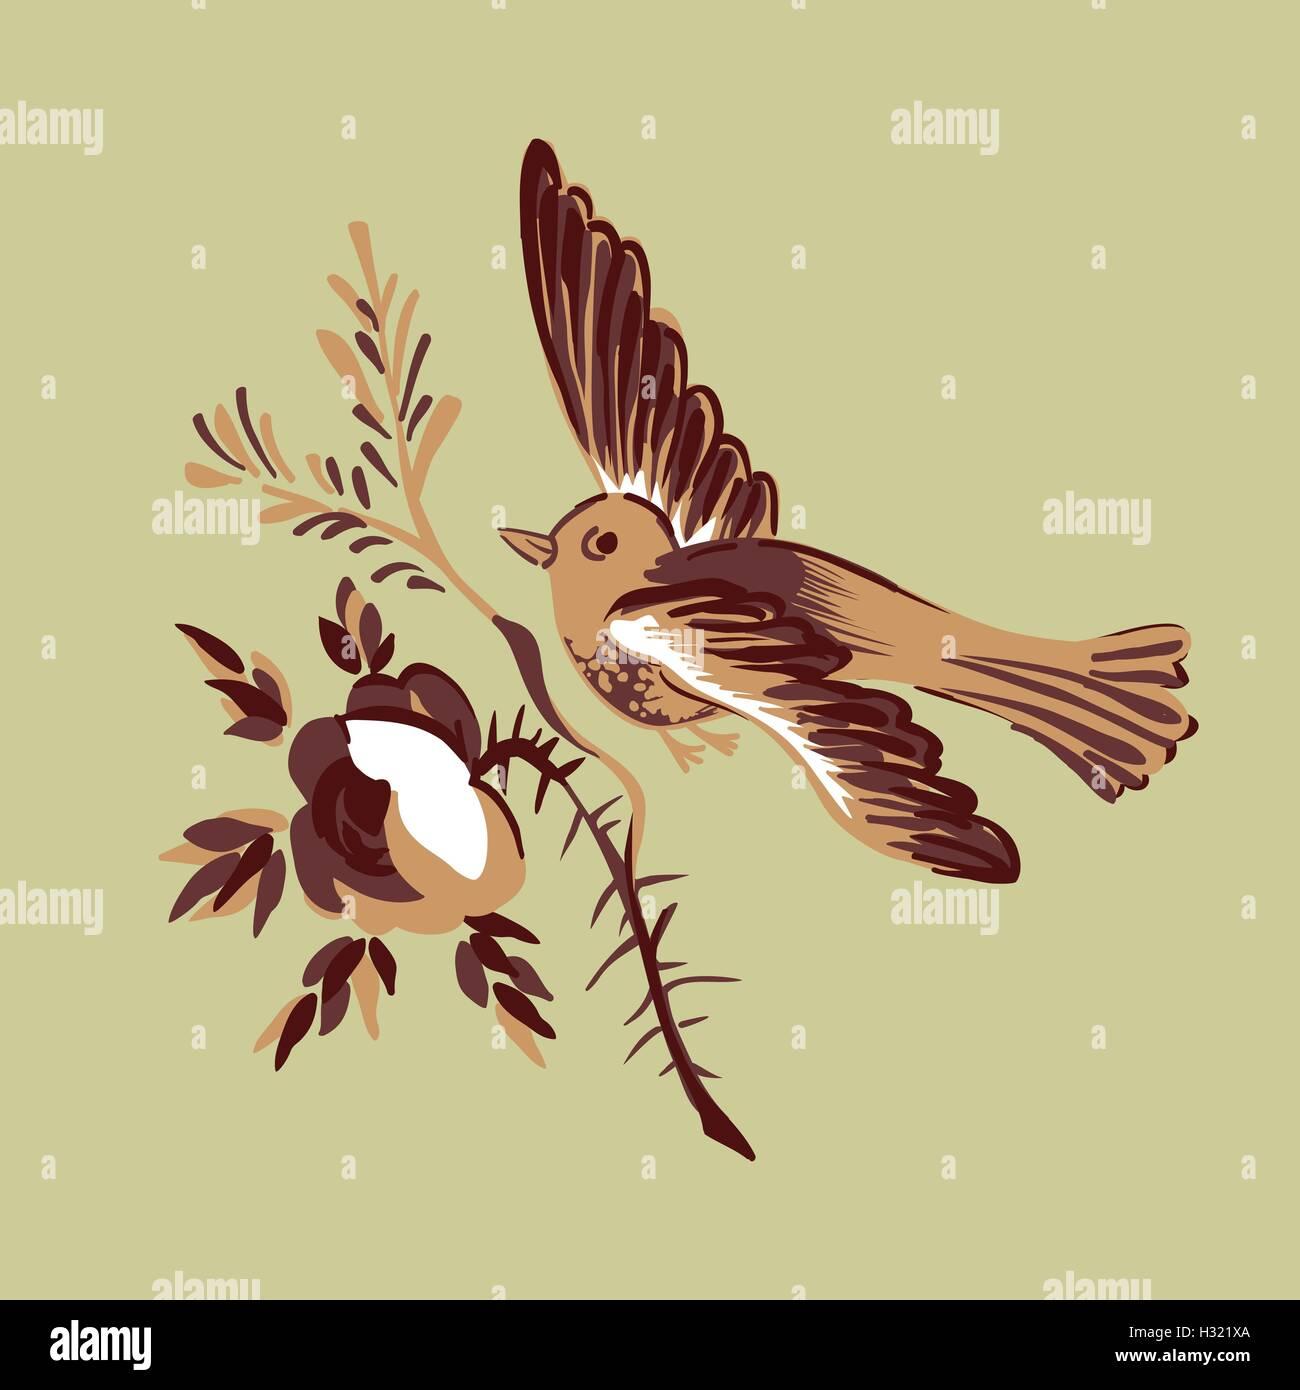 Flying Bird Stock Vector Images - Alamy